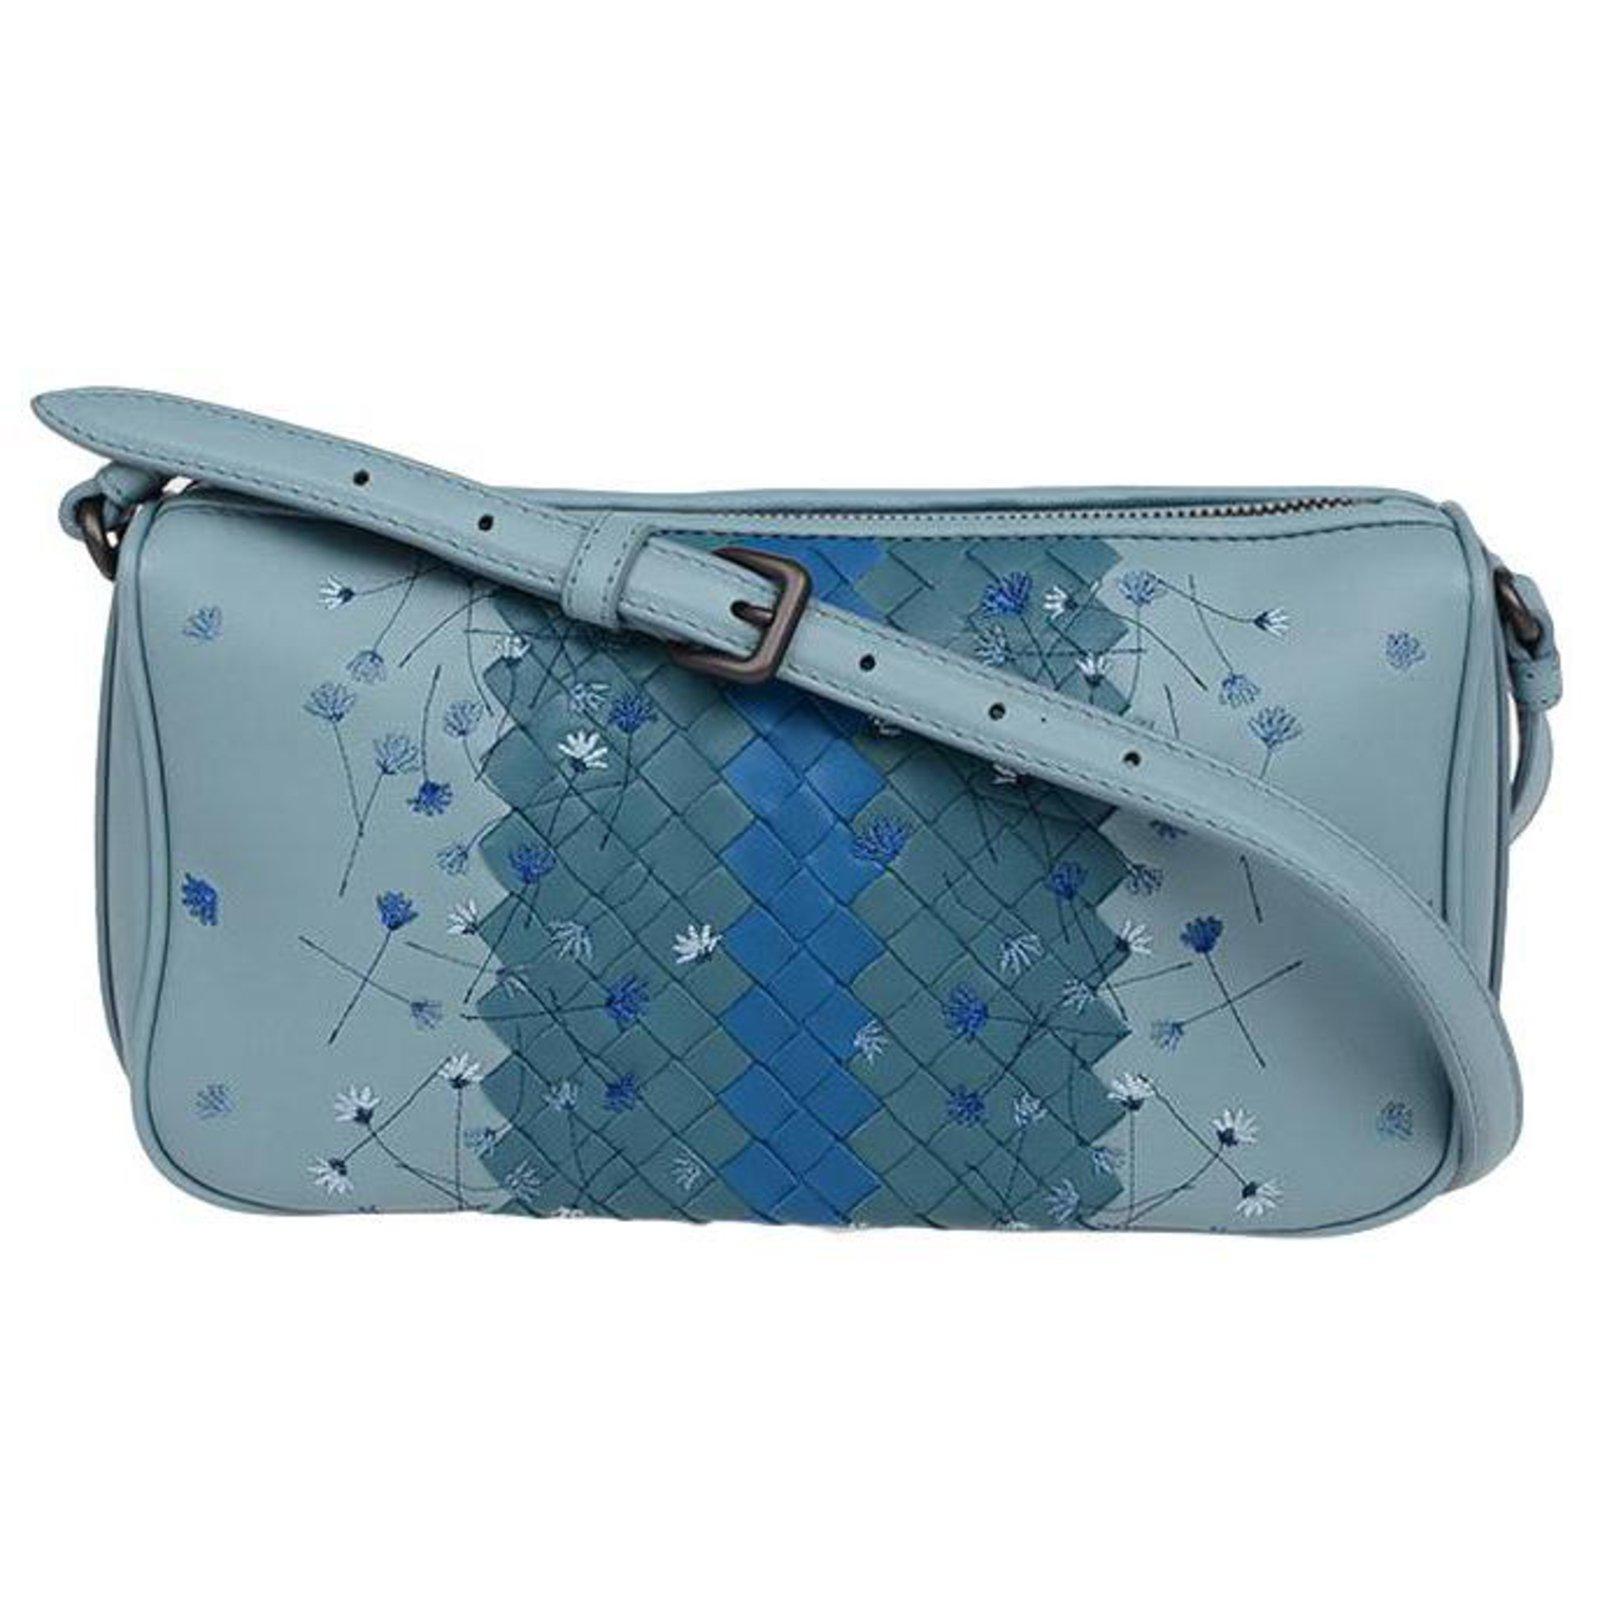 bd5e4473cf73 Bottega Veneta Shoulder bag Handbags Leather Blue ref.77710 - Joli ...